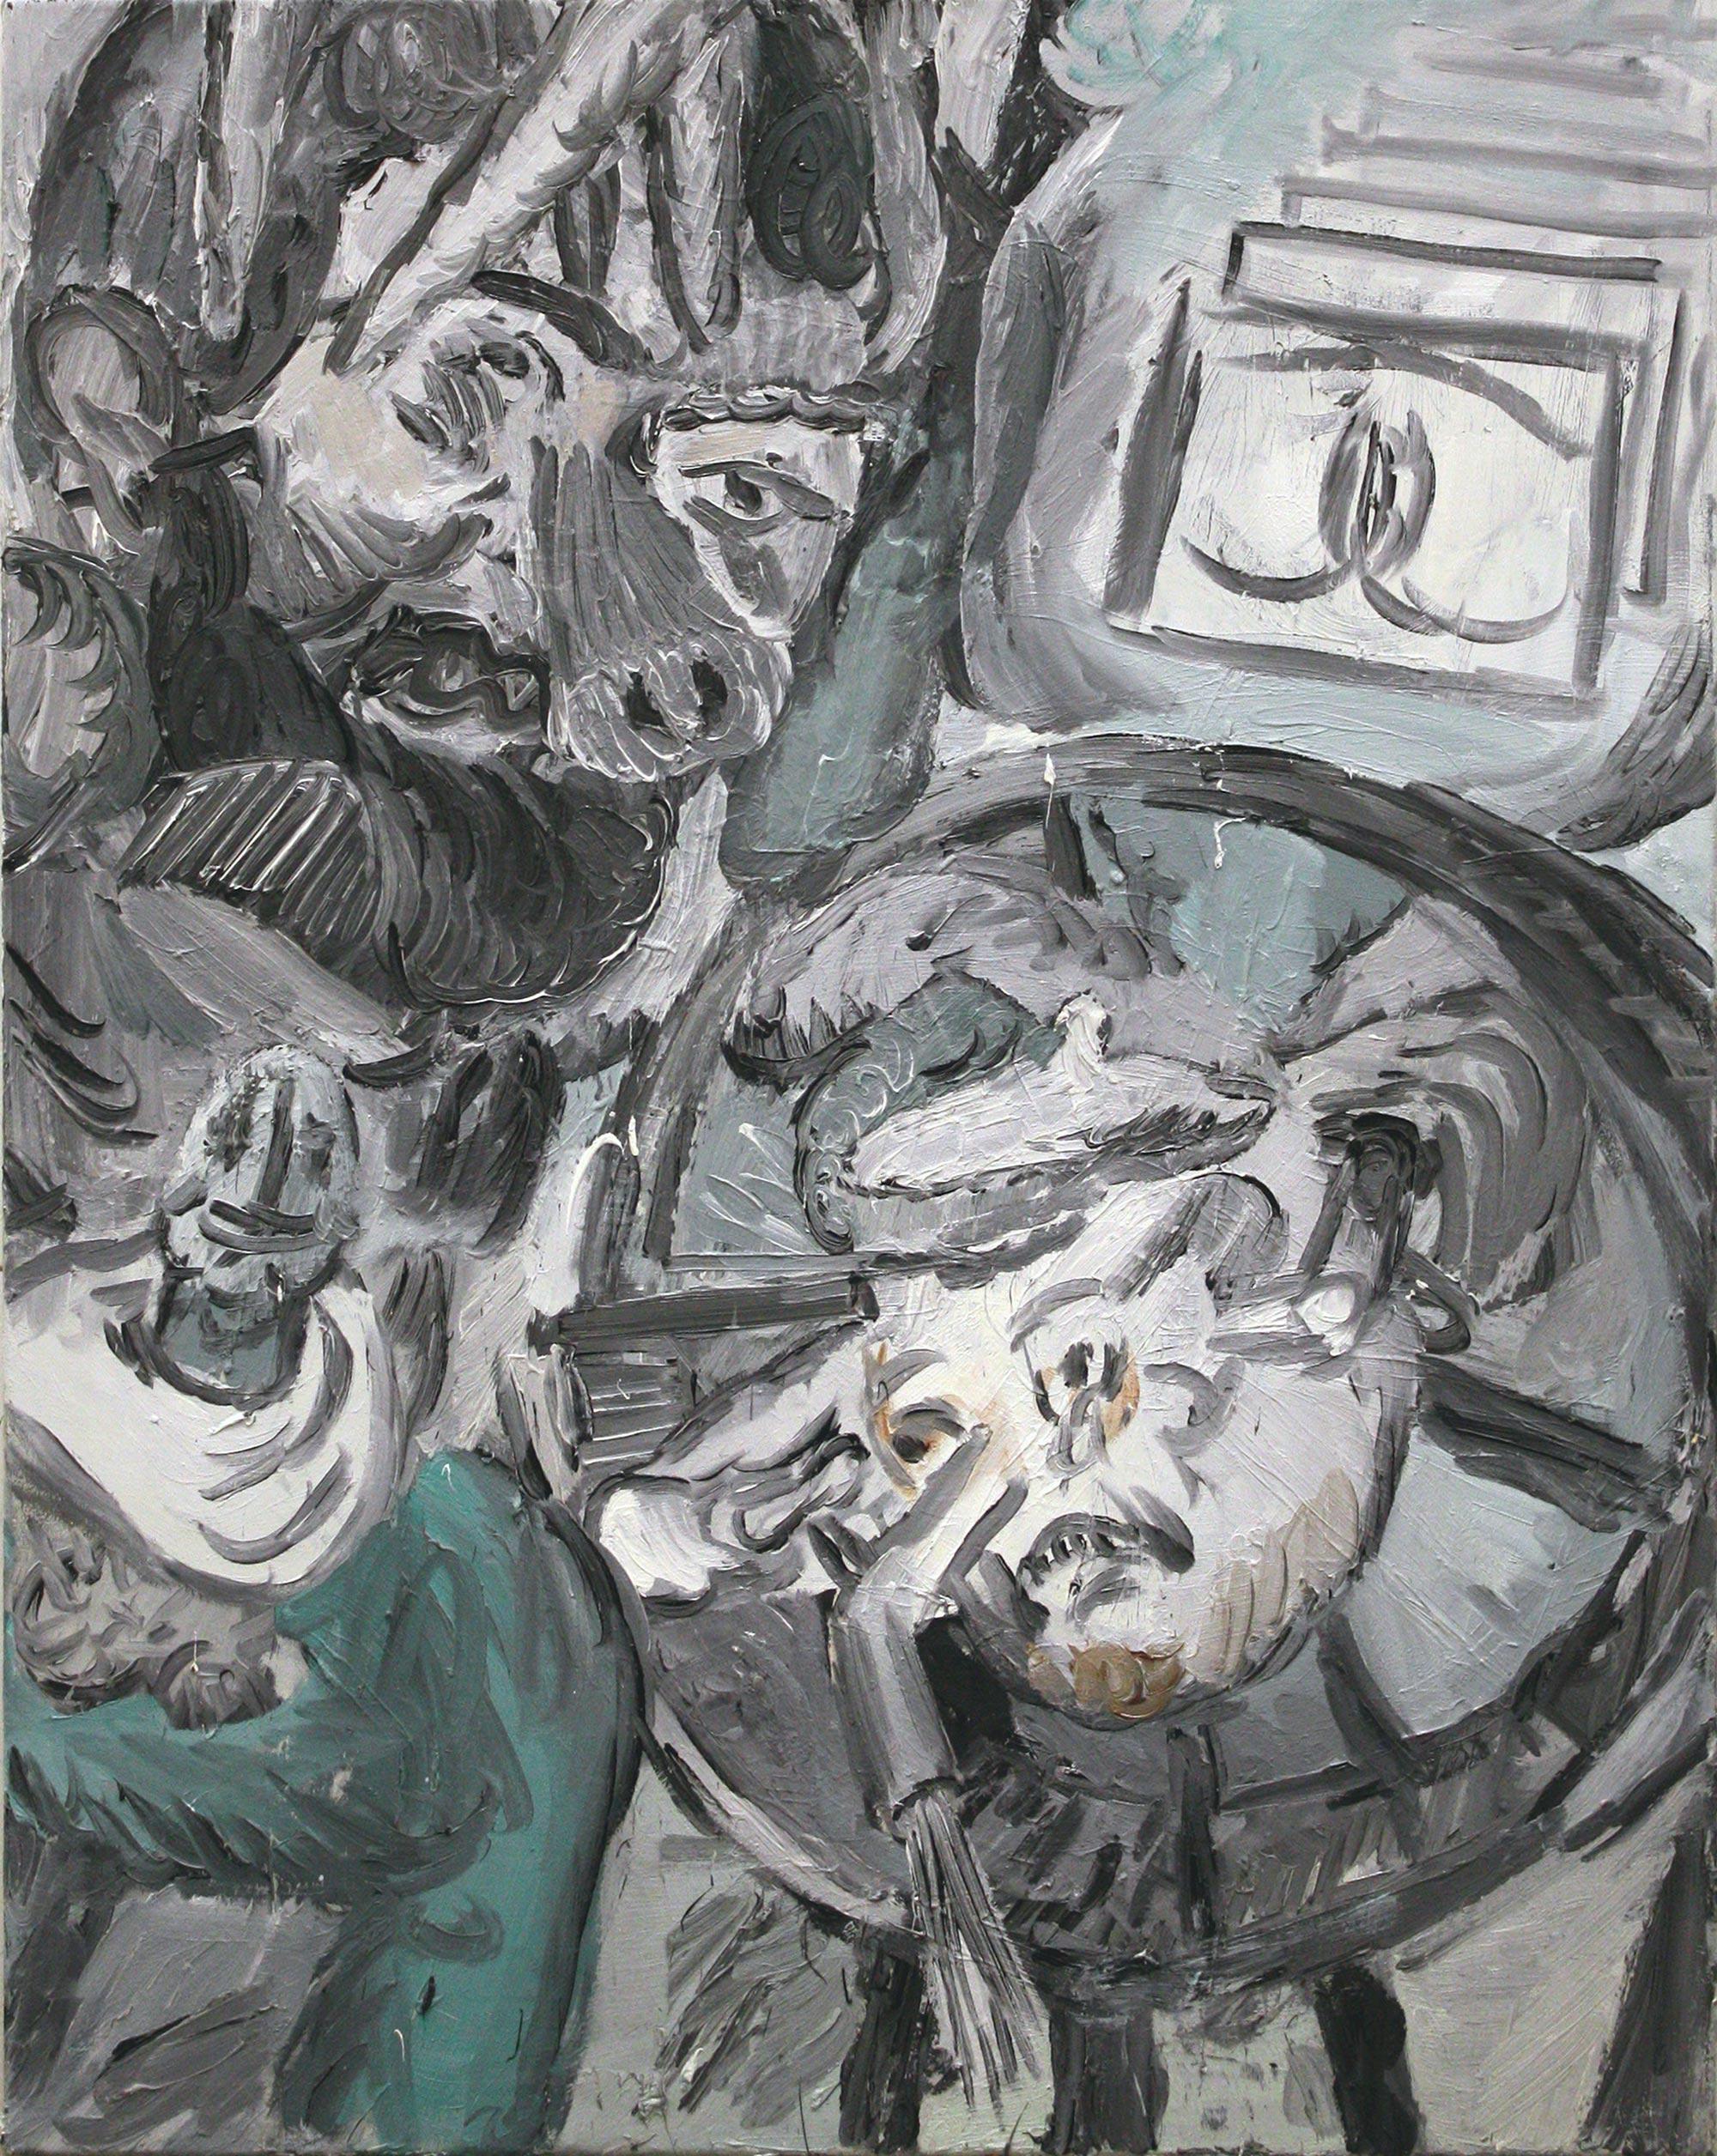 'Onan the boiling teapot' 2016   Oil on canvas. 80 x 100 cm